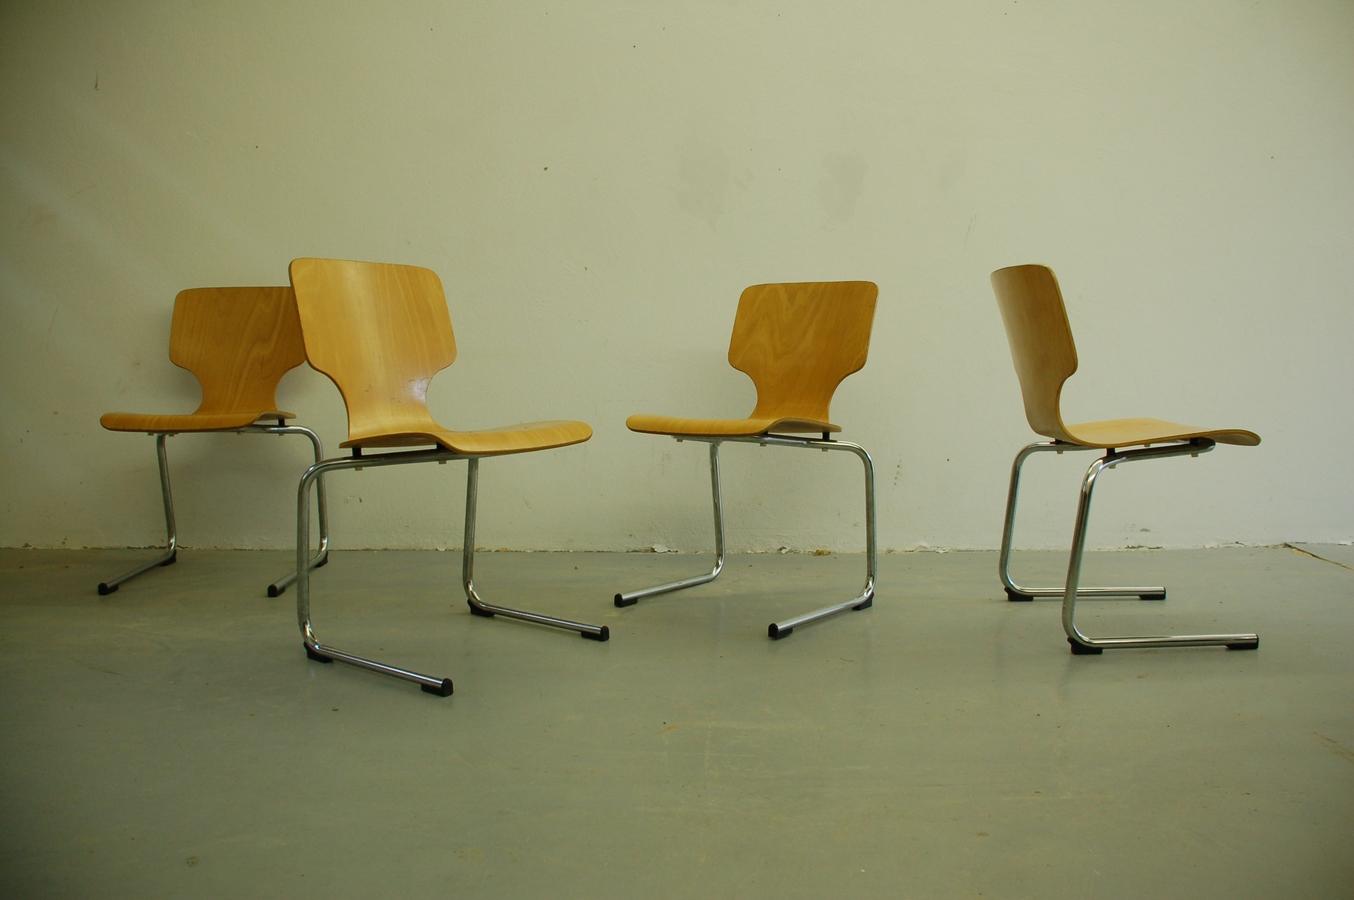 Vintage Freischwinger Stühle Used Chairs Mid Century Modern (1) a